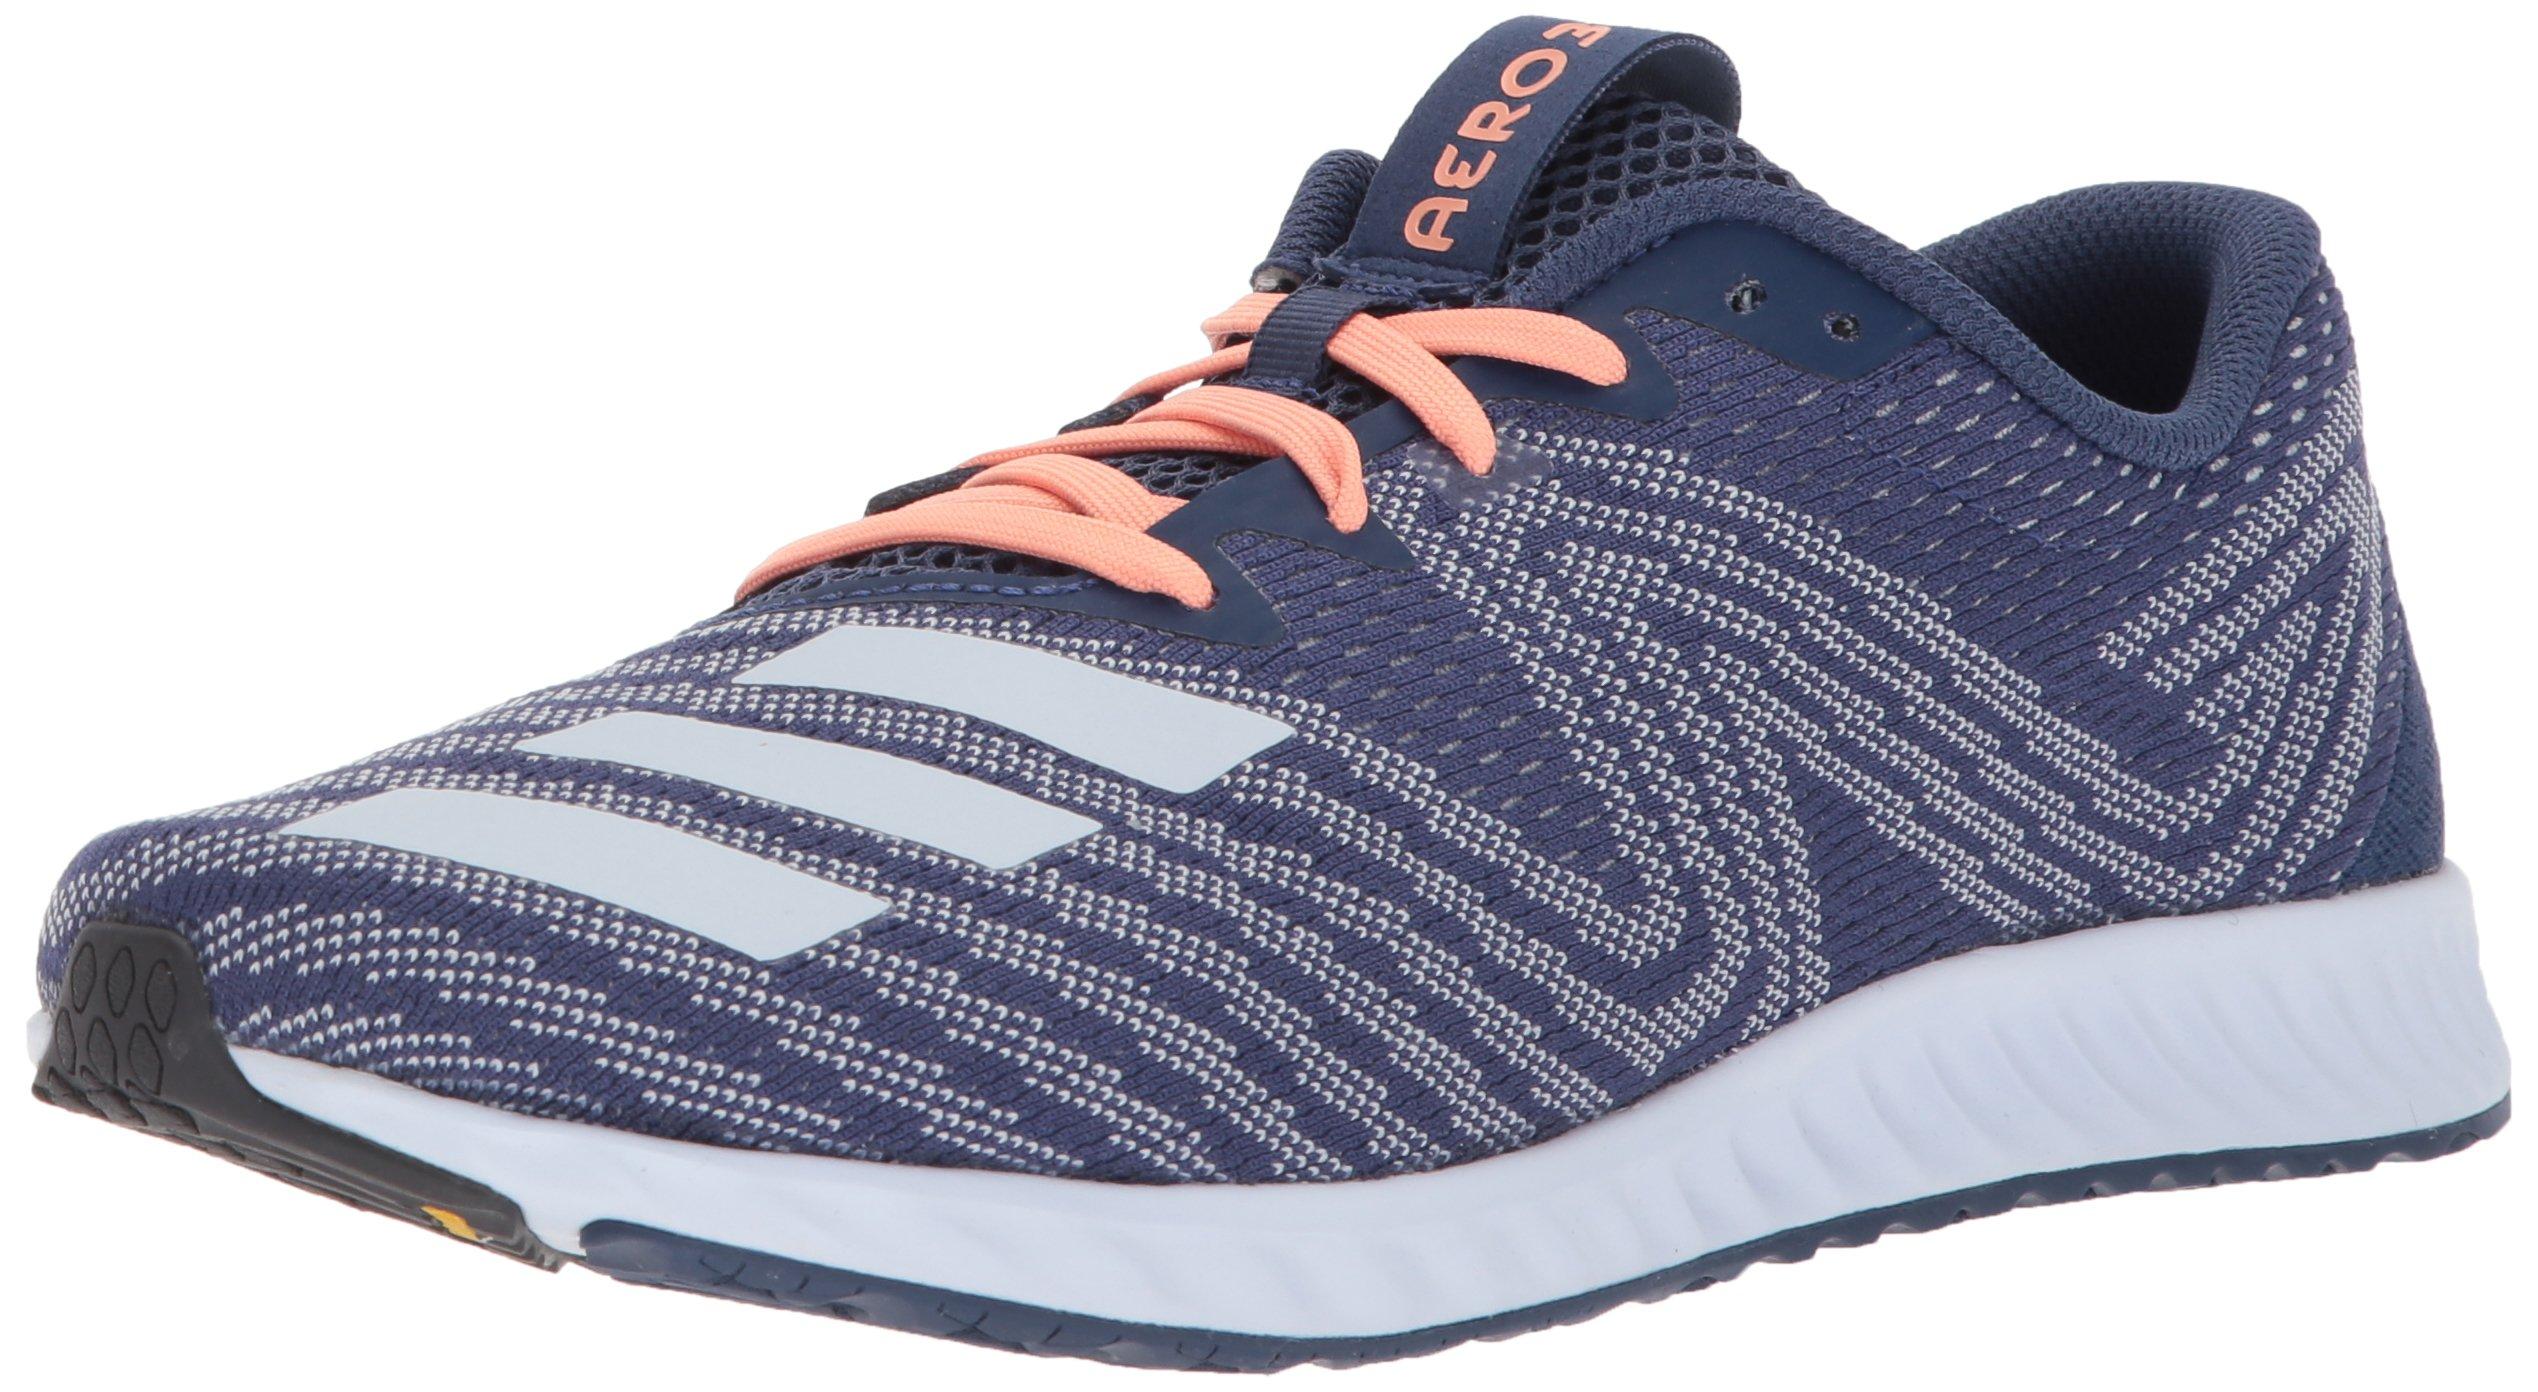 detailed look 1321a 98c07 Galleon - Adidas Womens Aerobounce Pr W Running Shoe Aero BlueNoble  Indigo, 6 M US